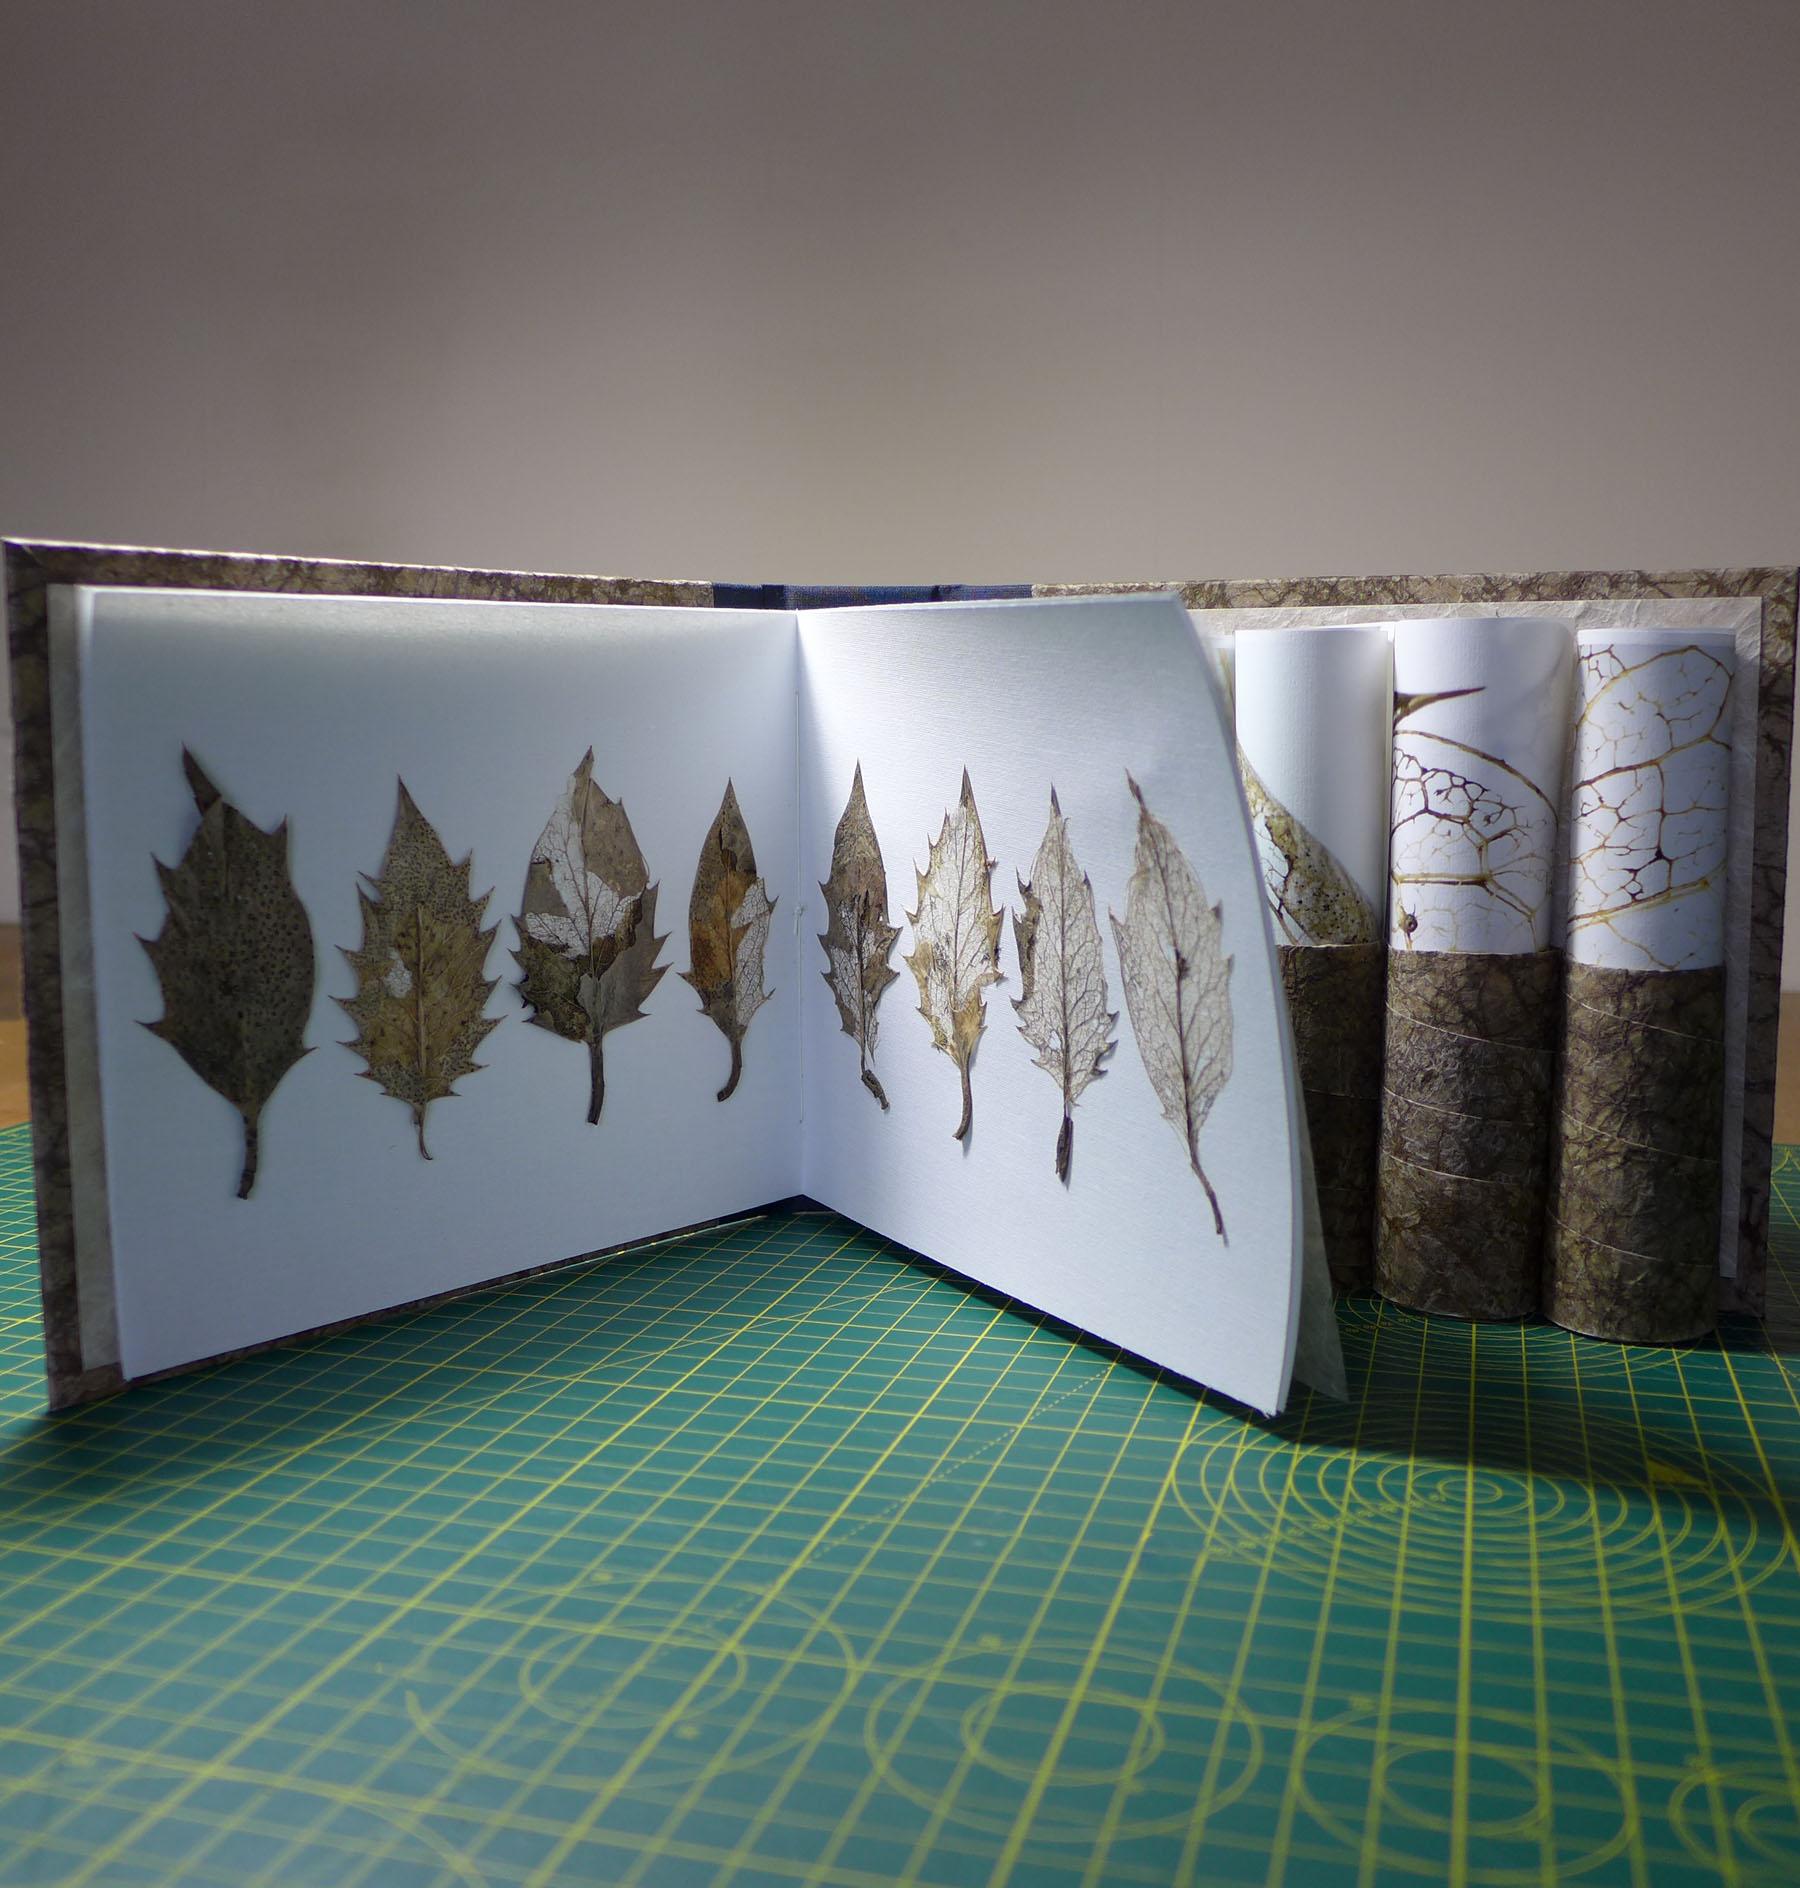 'Venation' artists' book interior